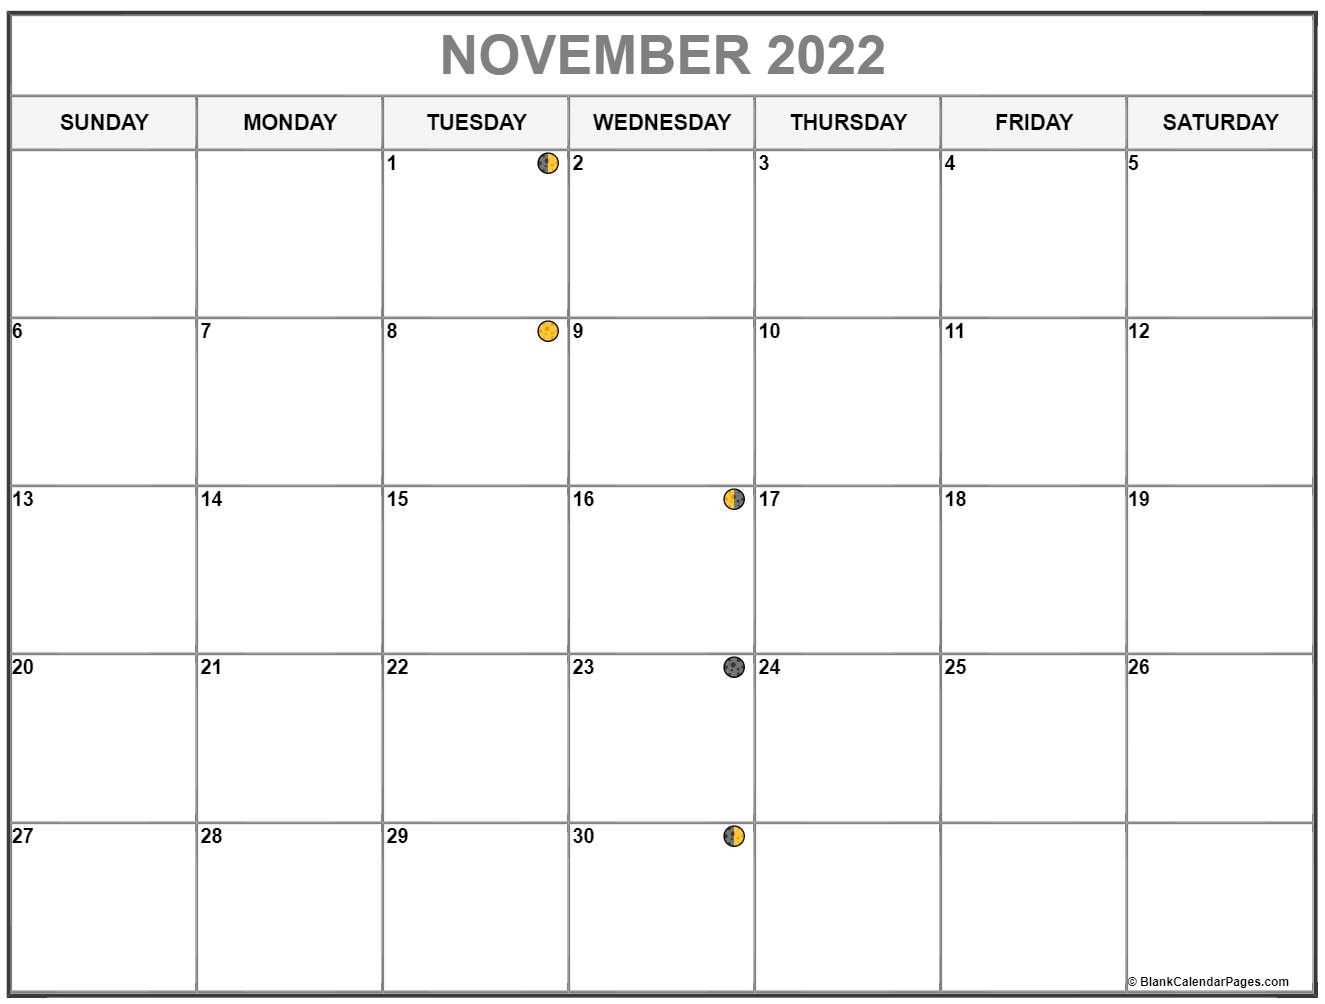 November 2022 lunar calendar. Moon phases with USA holidays